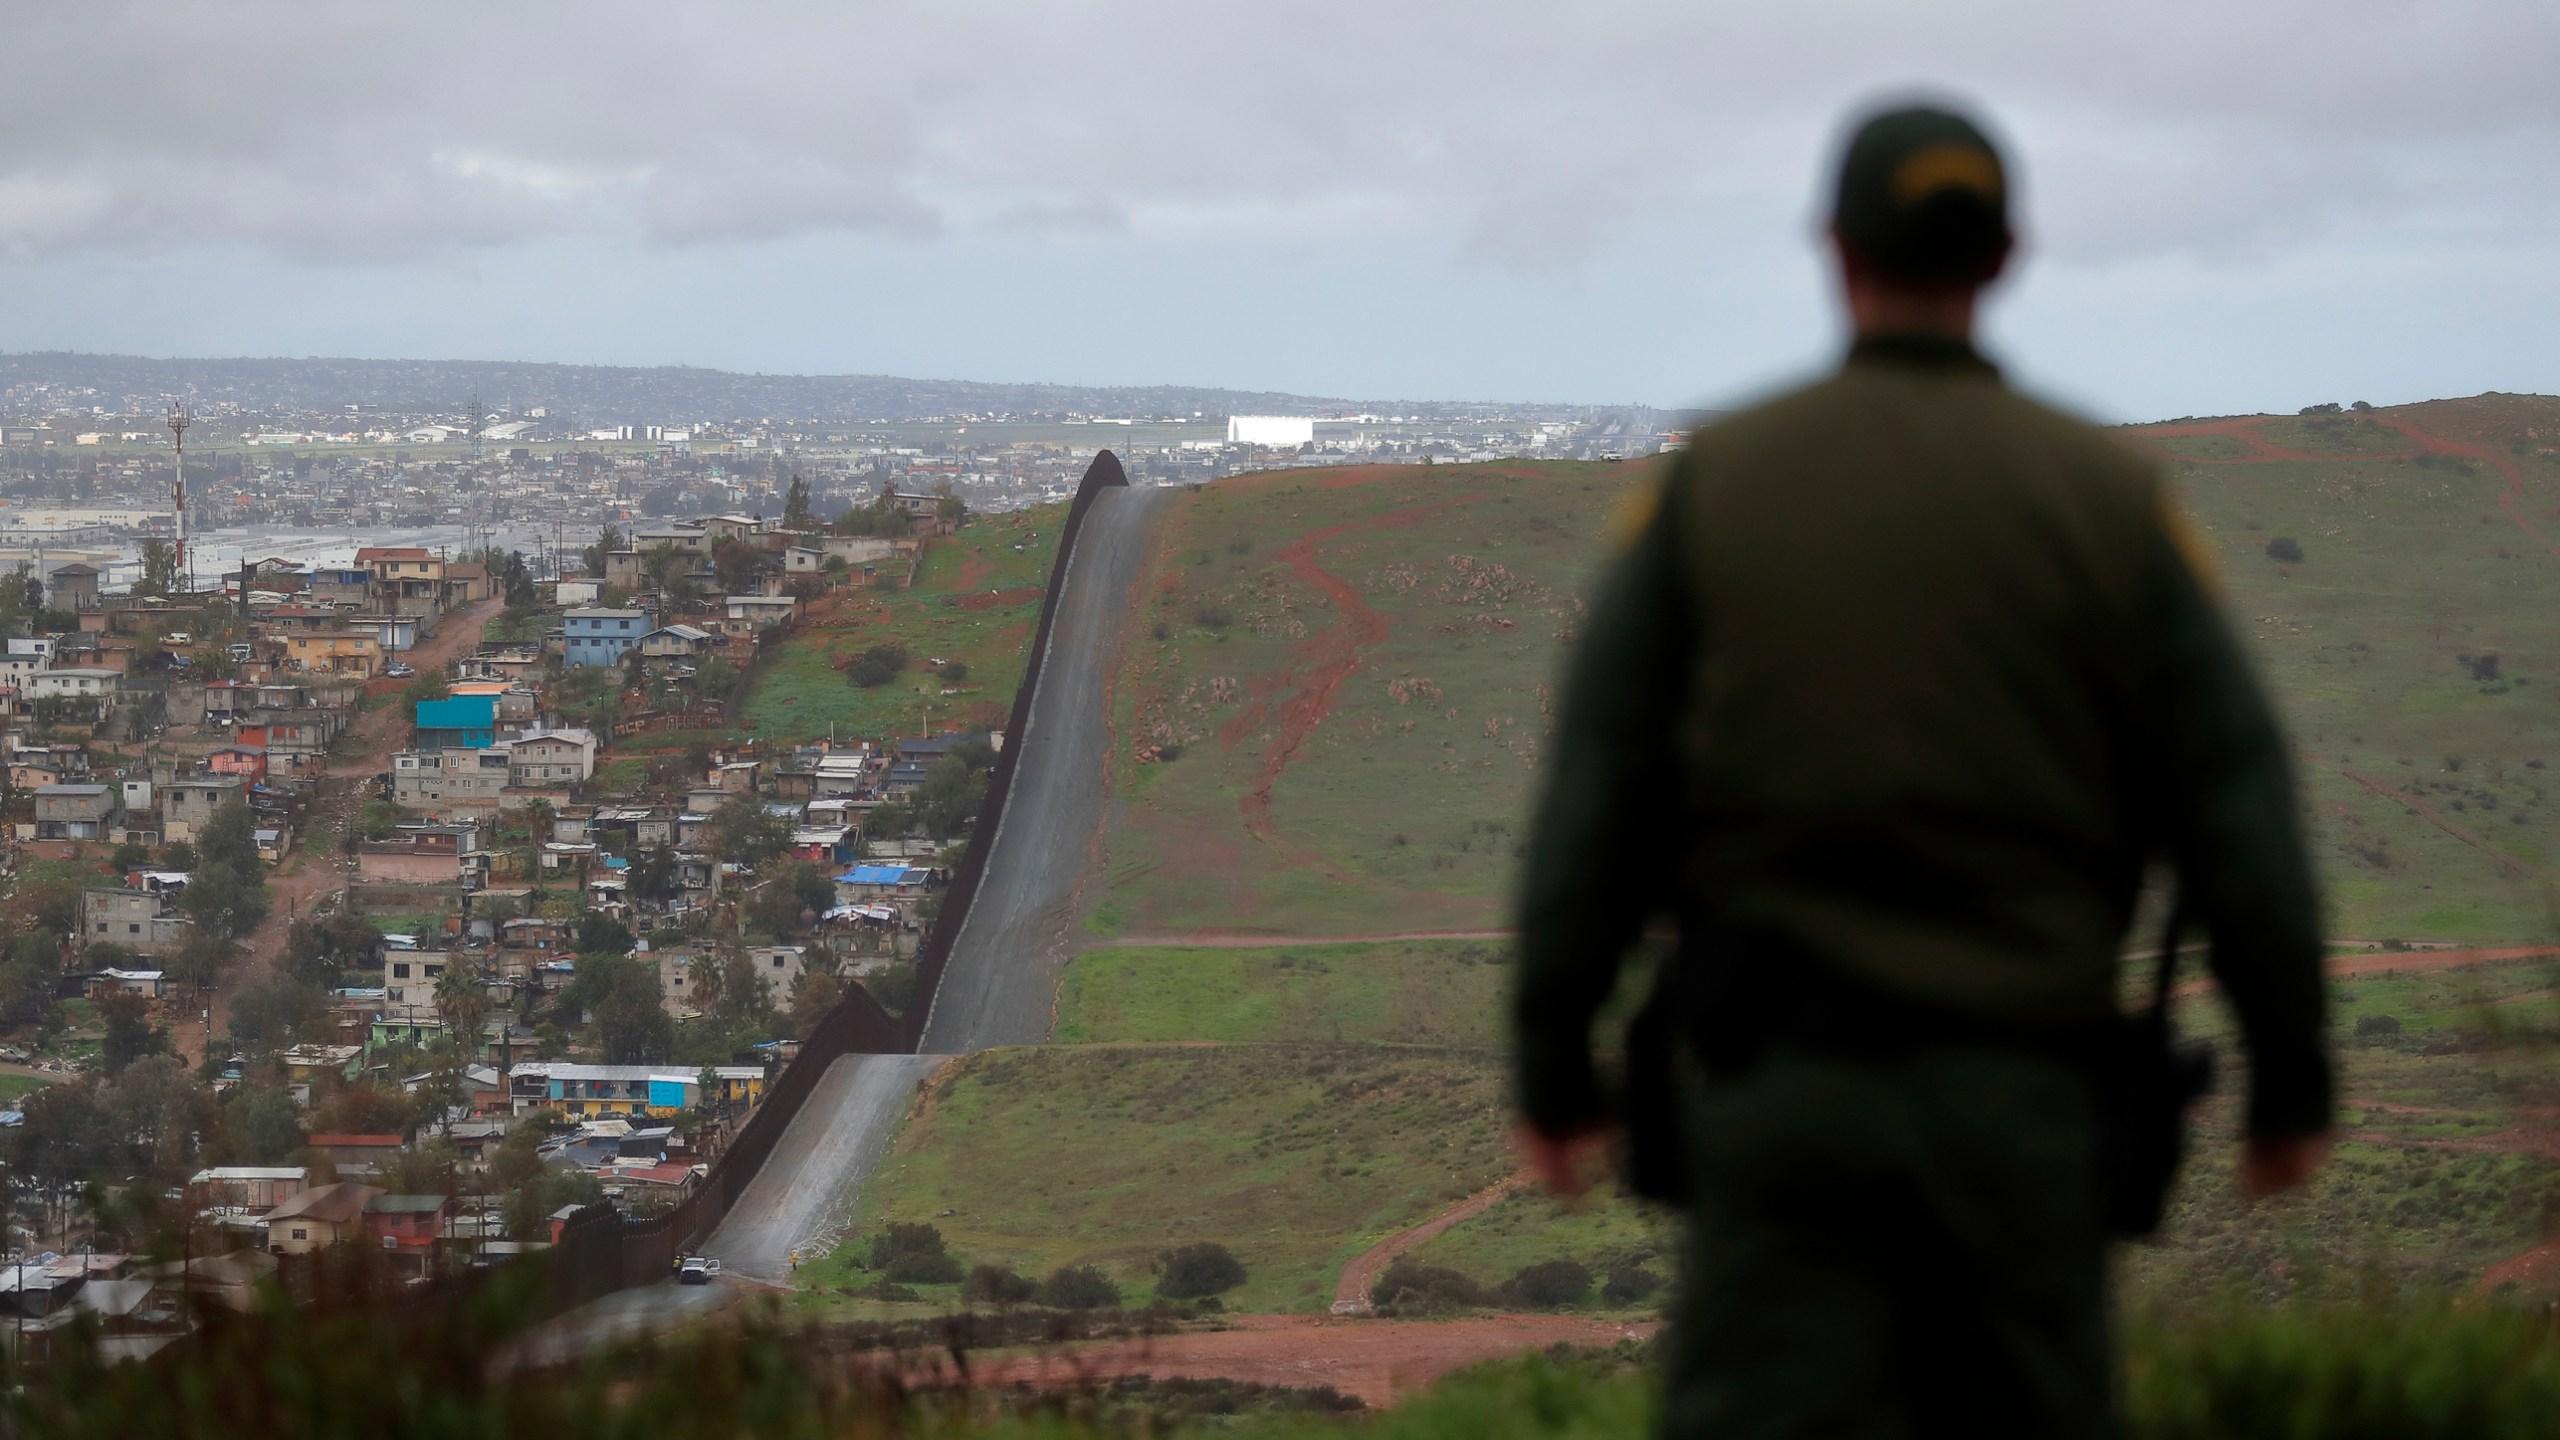 Border_Patrol_Biometrics_94921-159532.jpg77760934